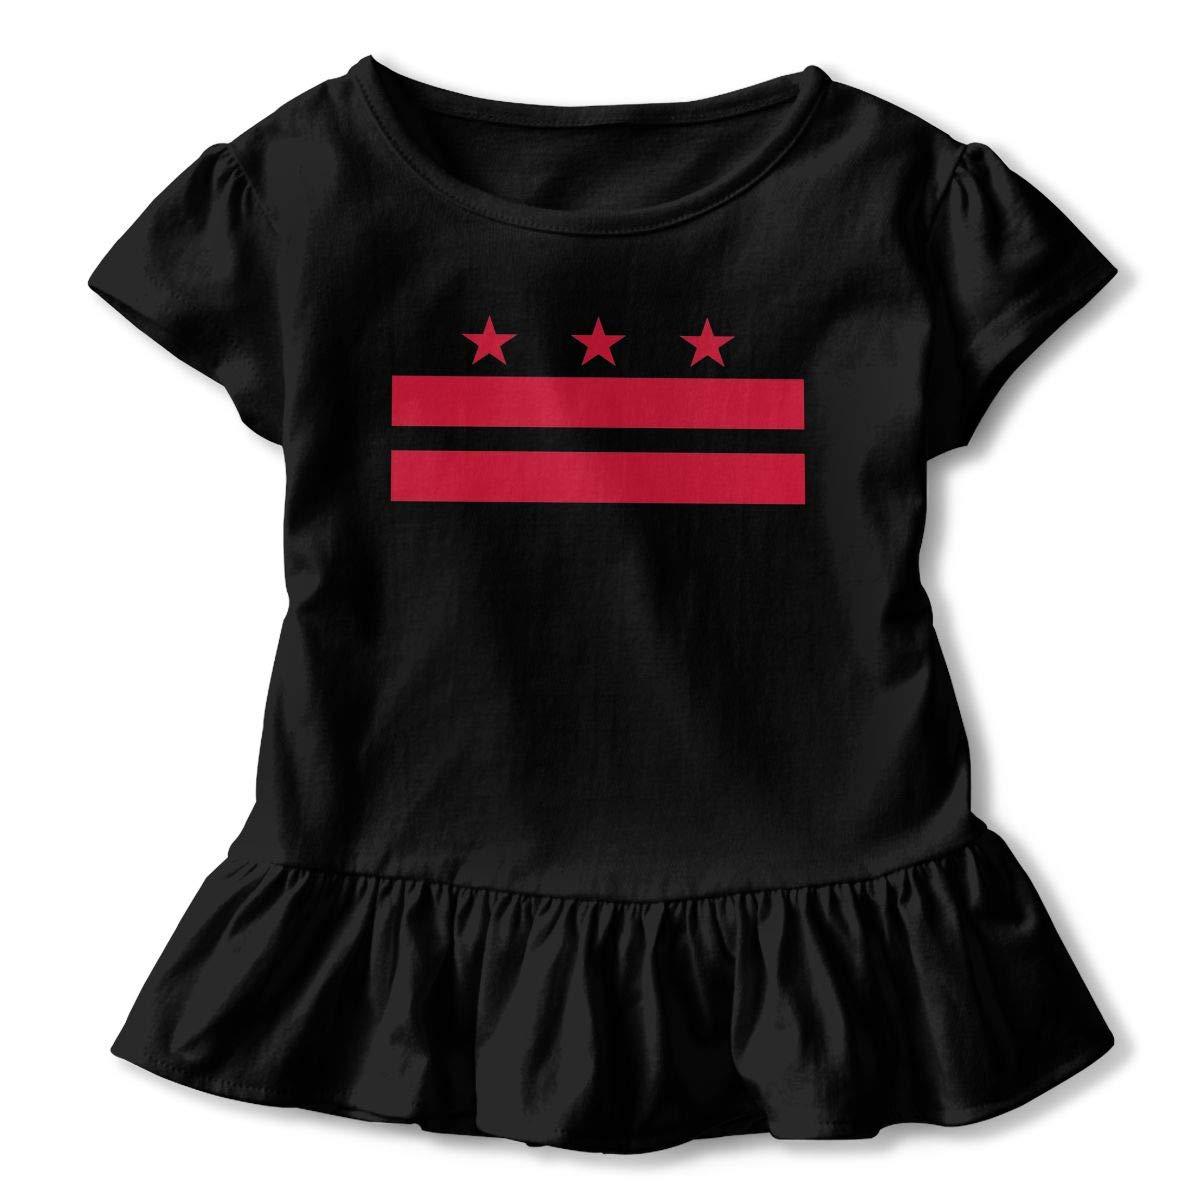 Washington DC Flag Toddler Baby Girls Cotton Ruffle Short Sleeve Top Basic T-Shirt 2-6T